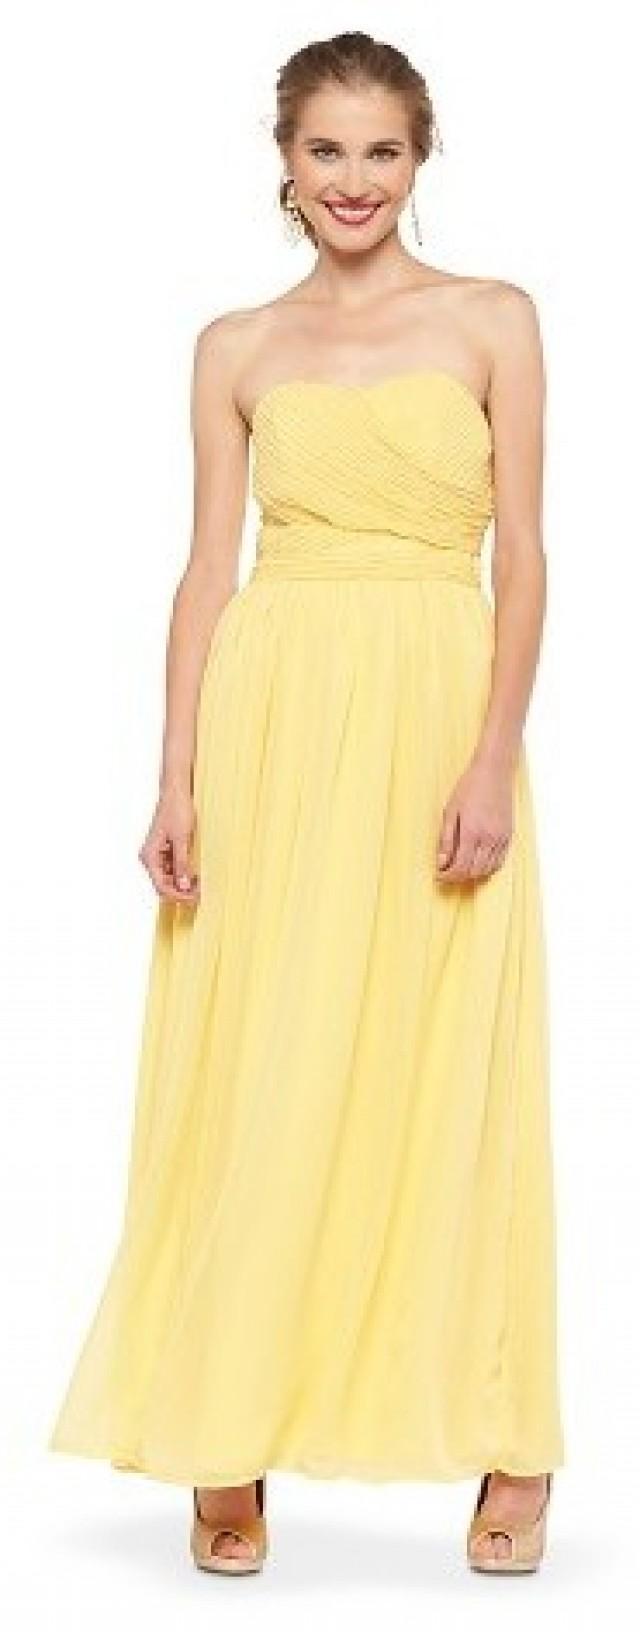 Tevolio women 39 s chiffon strapless maxi bridesmaid dress for Yellow maxi dress for wedding